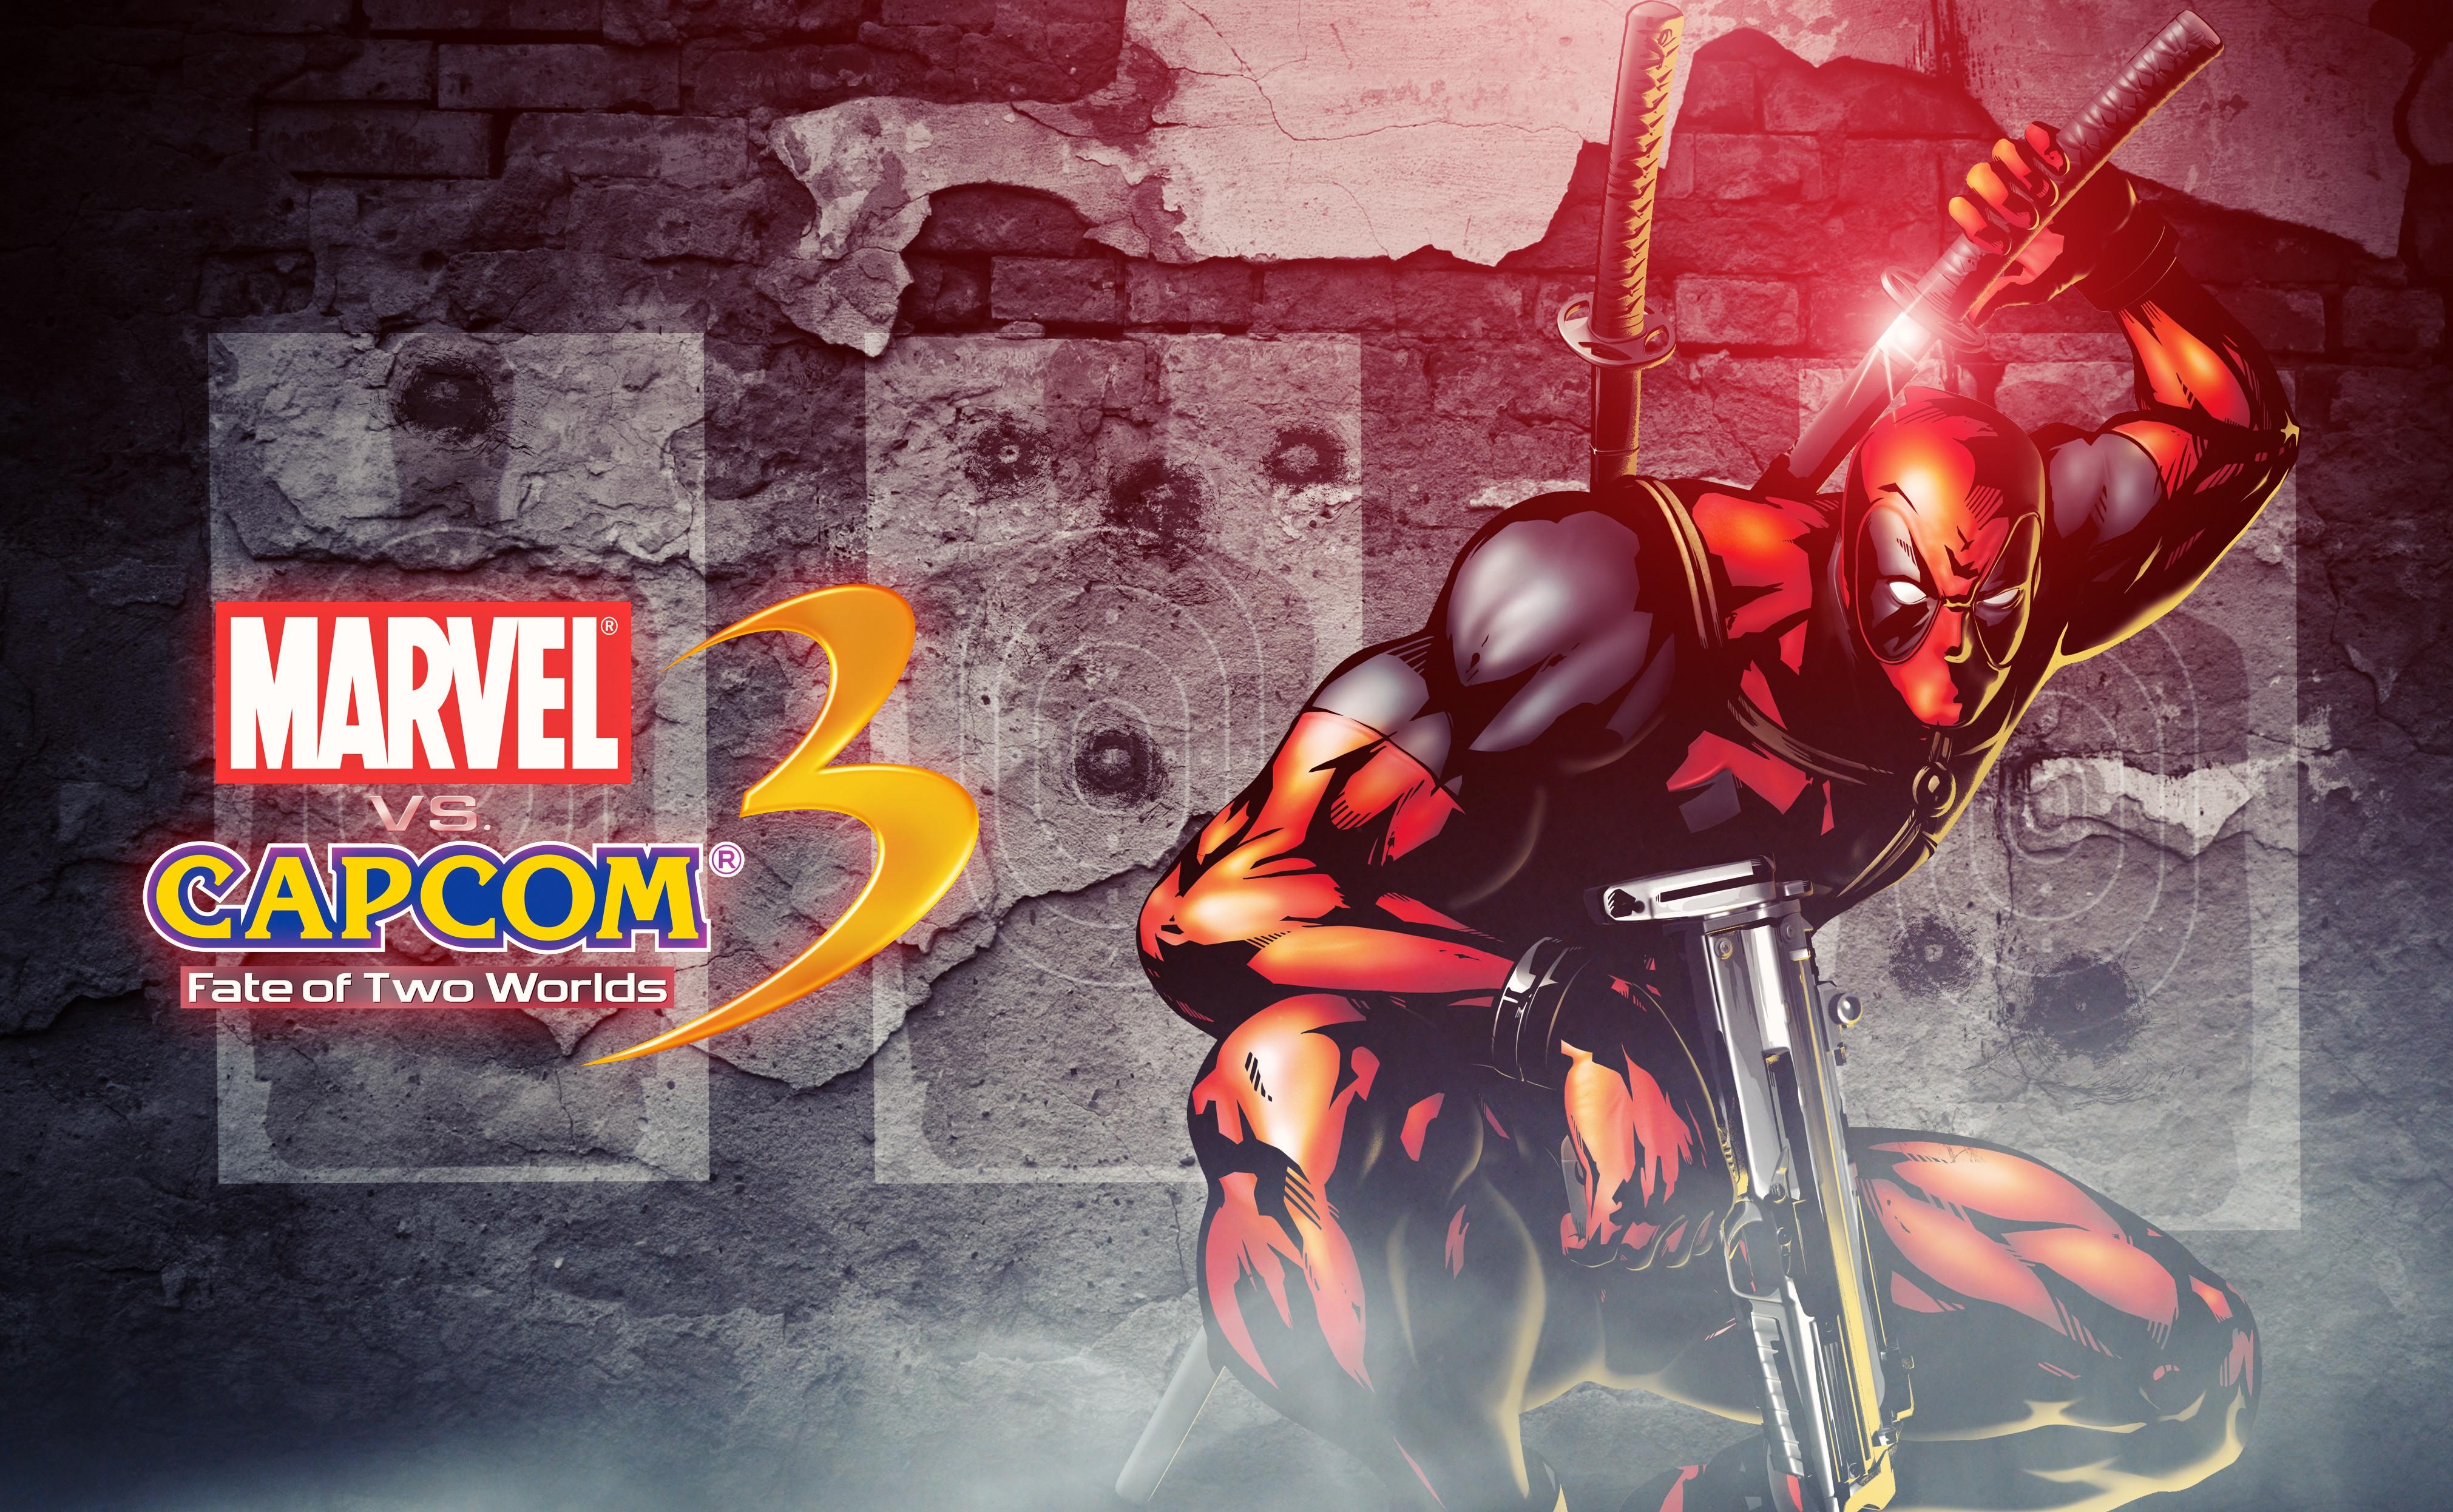 Marvel Vs Capcom 3 Fate Of Two Worlds 4k Ultra Hd Wallpaper